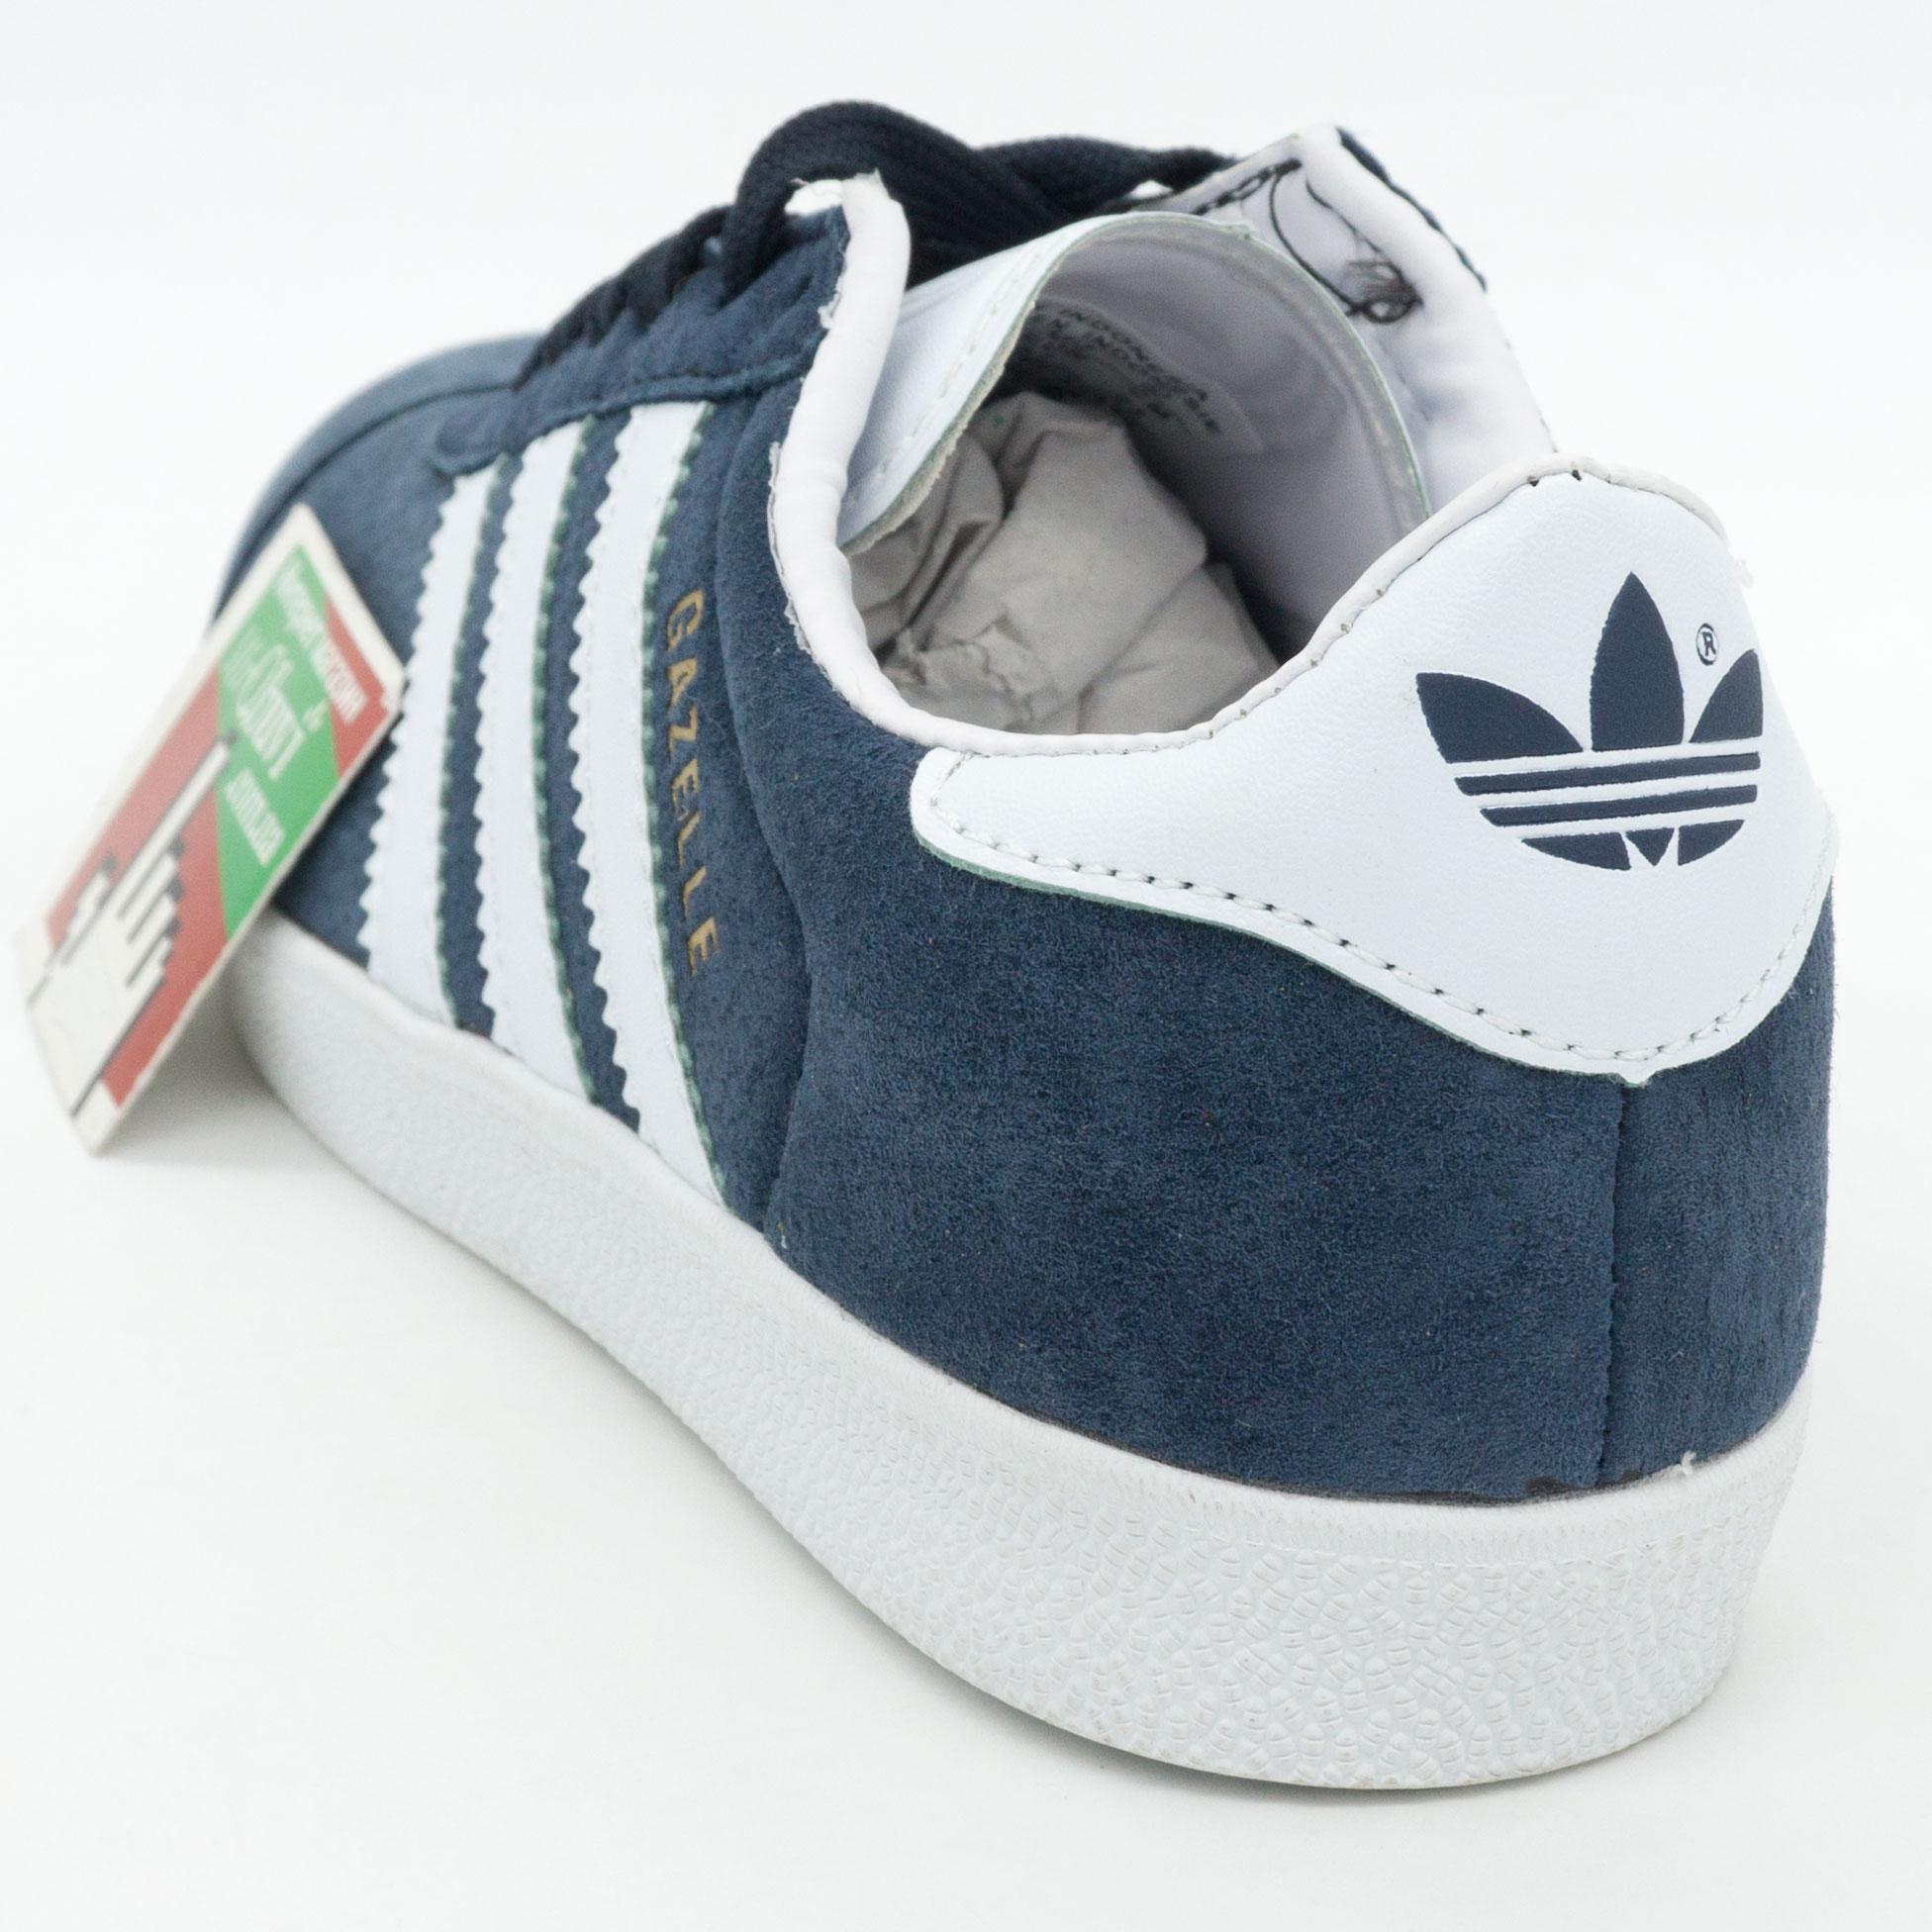 фото back Синие кроссовки Adidas Gazelle нтуральная замша Indonesia back